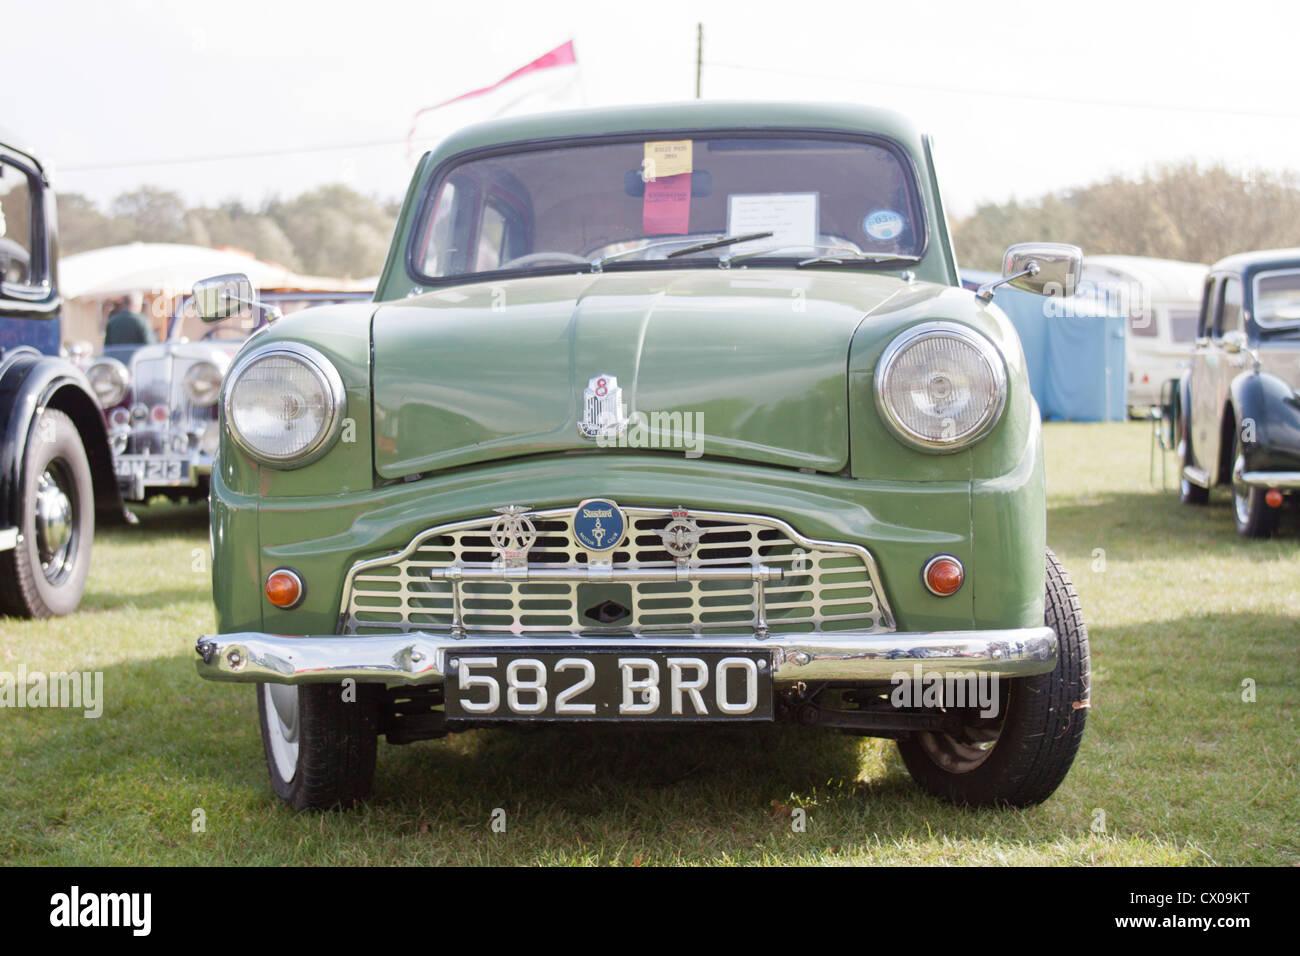 1957 Standard 8 at Malvern Autumn Show - Stock Image